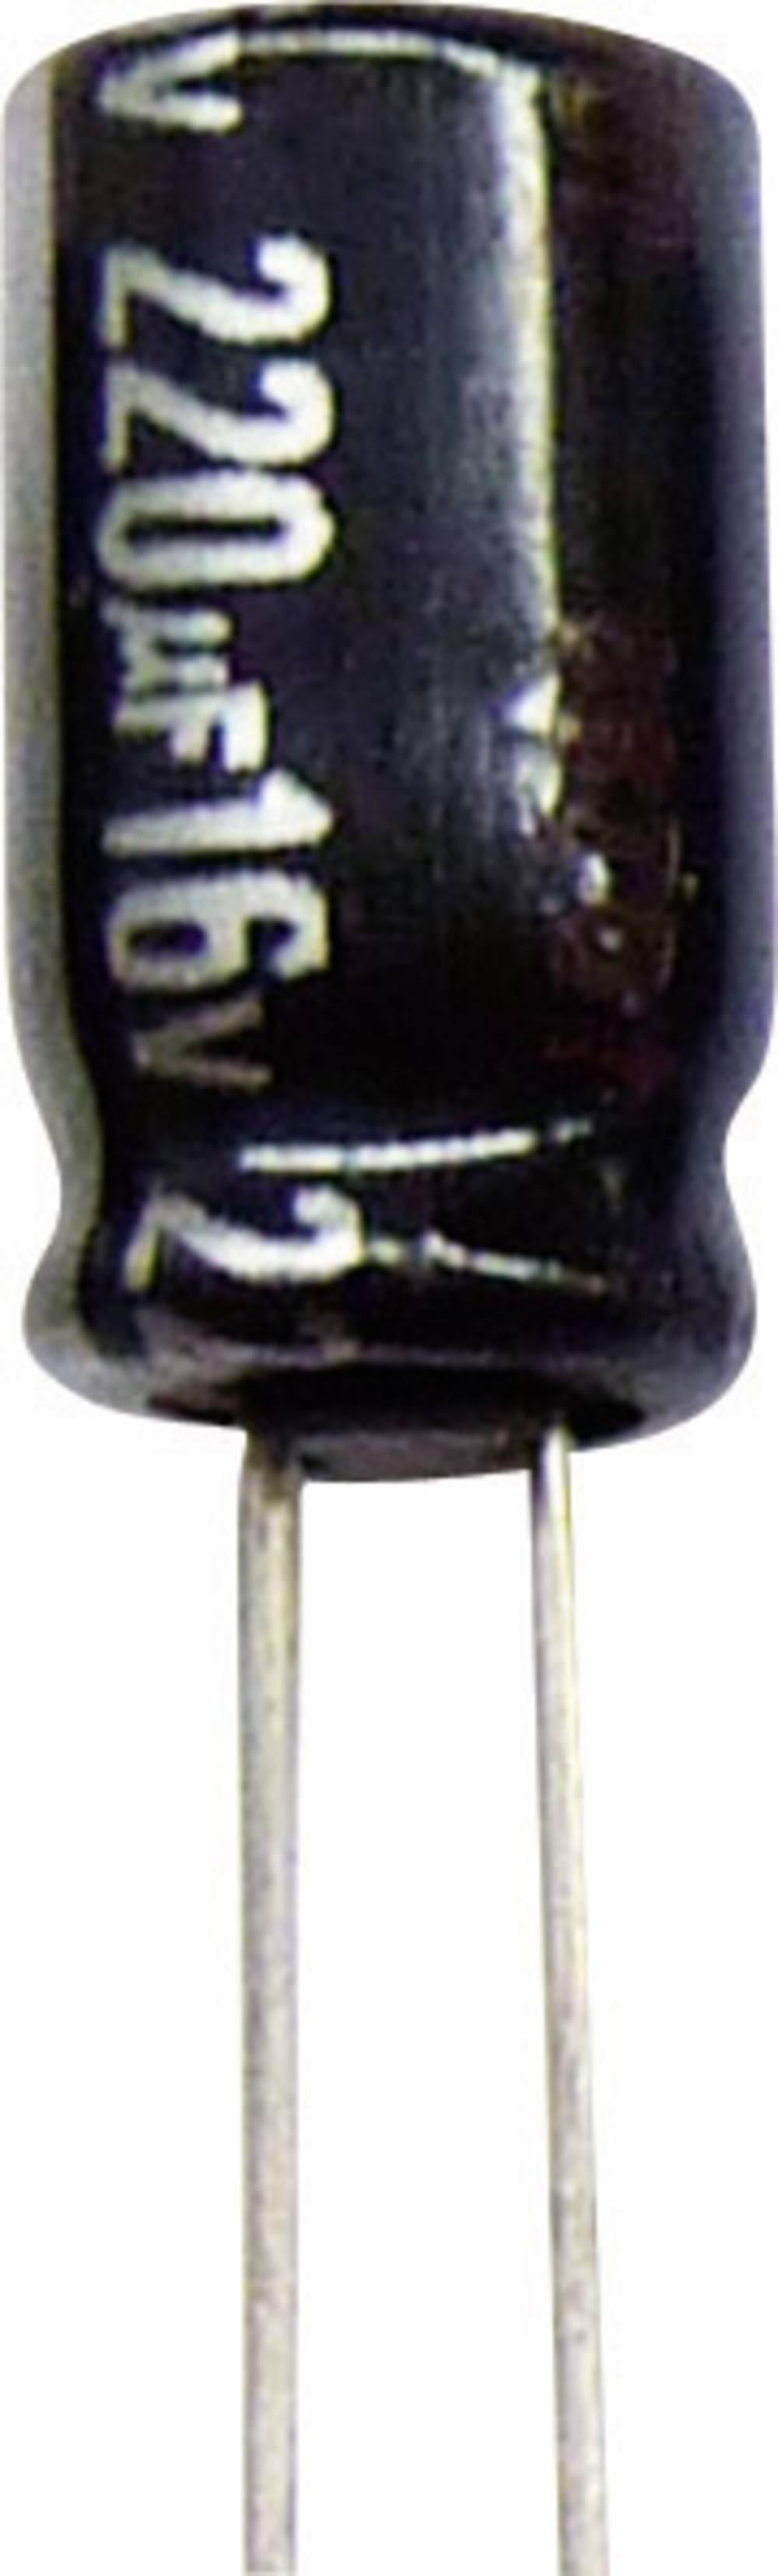 Panasonic Radijalni kondenzator (OxV) 16mm x 25mm raster 7.5mm 4700F 16 V ECA1CHG472